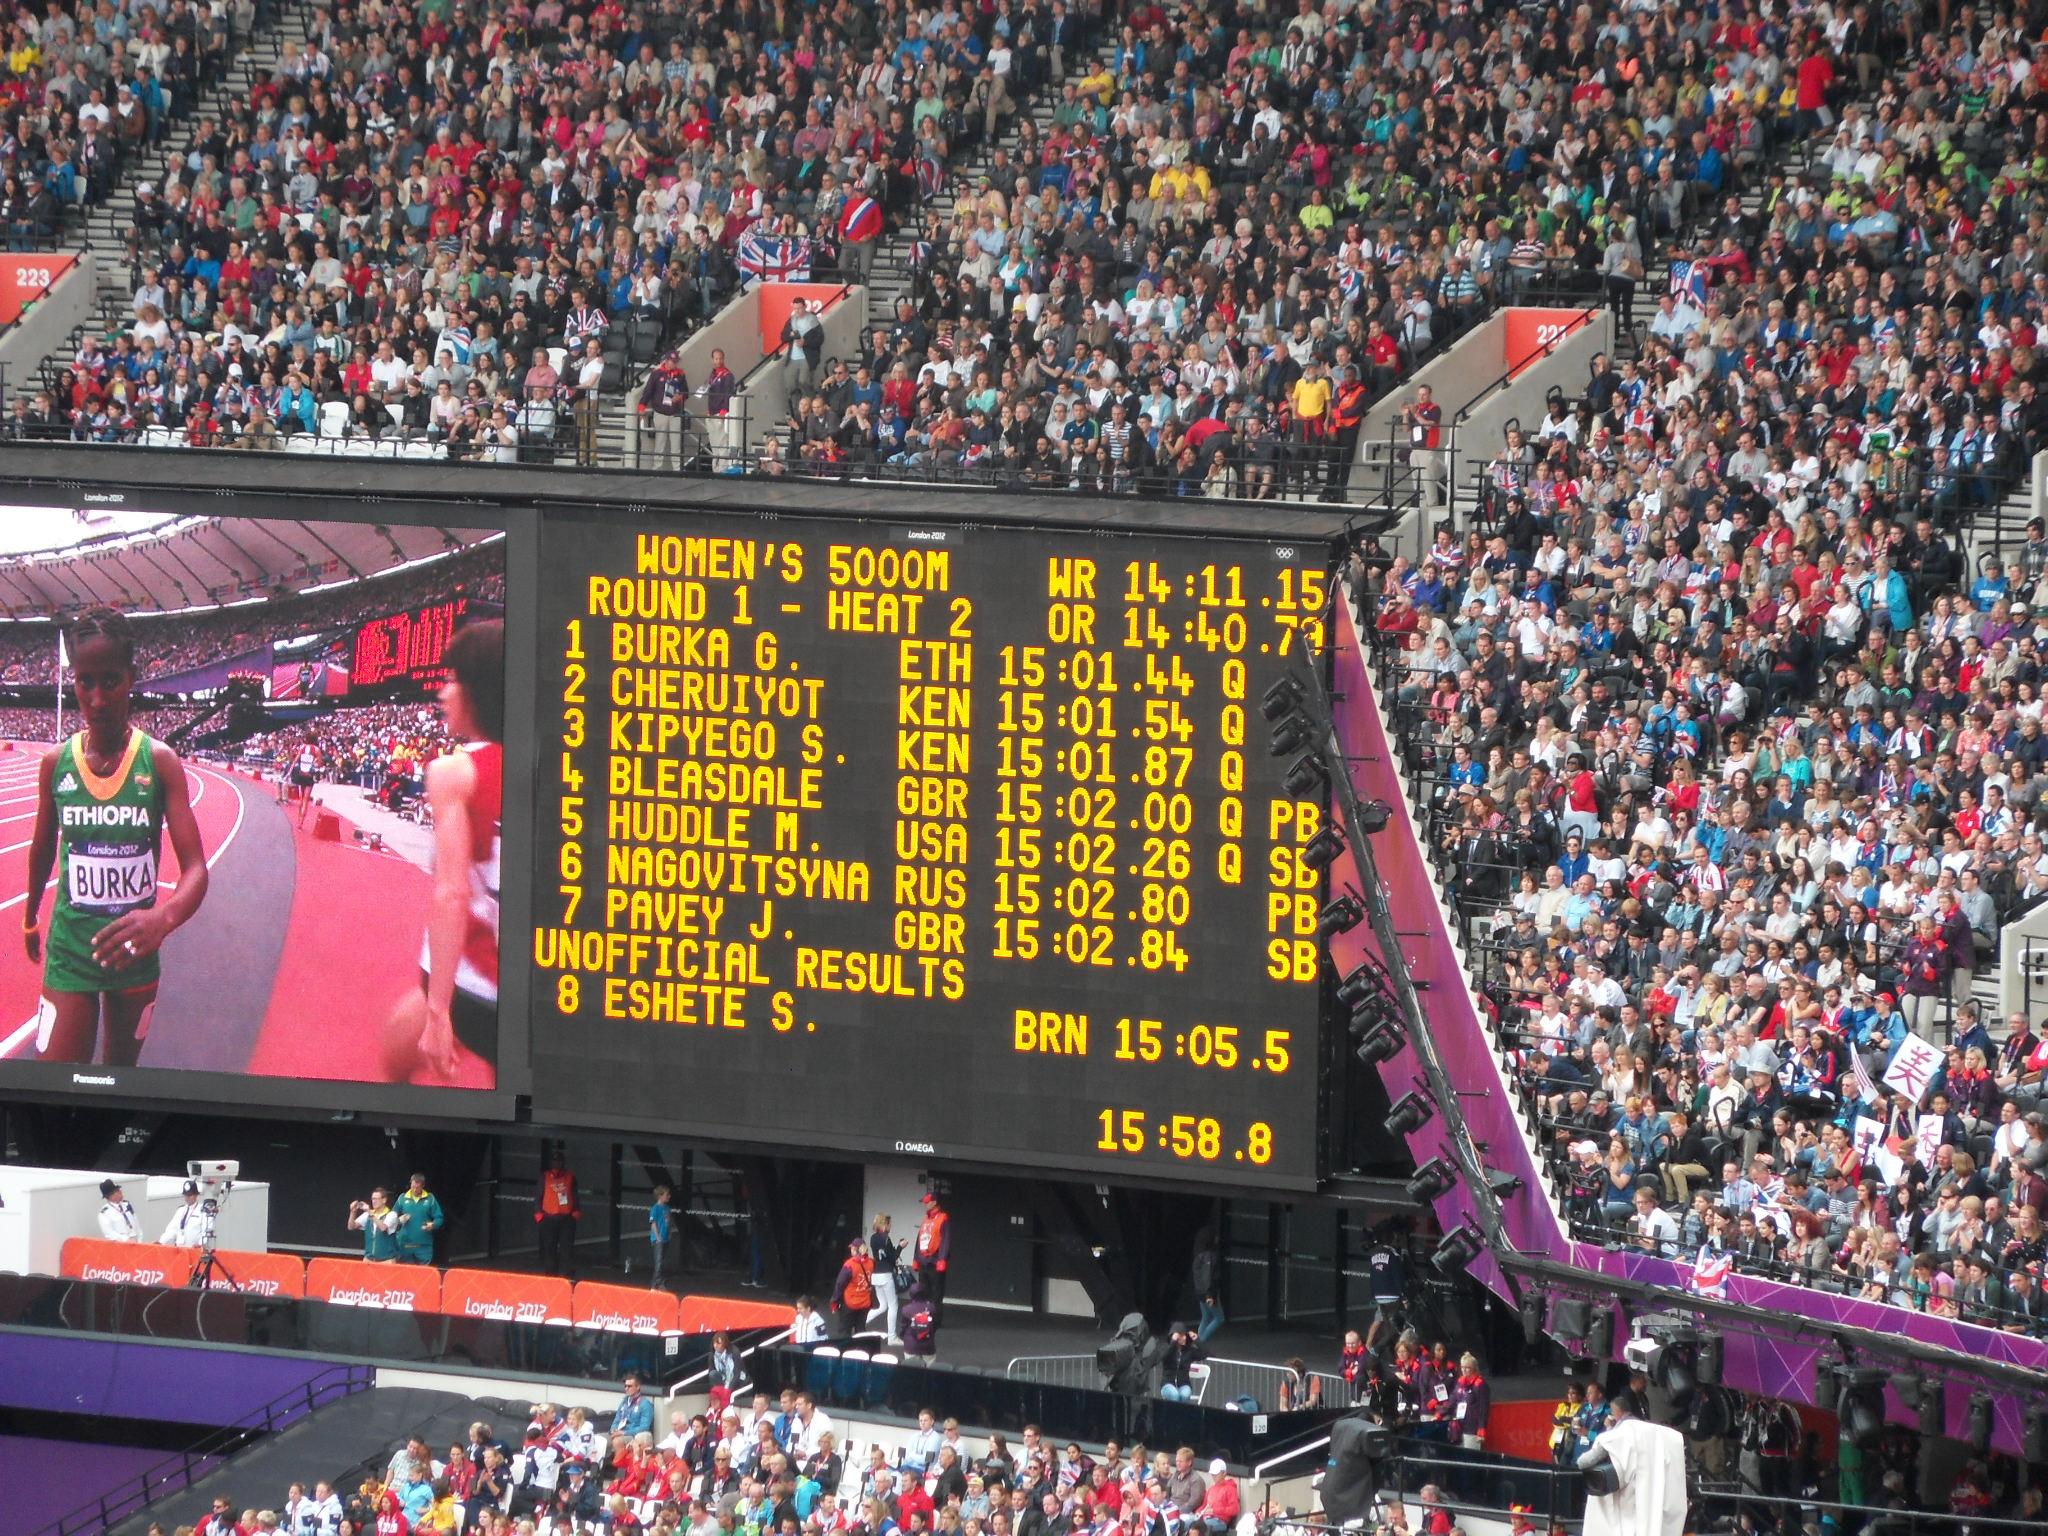 Olympic Park 20120807 016 W5K r1 h2